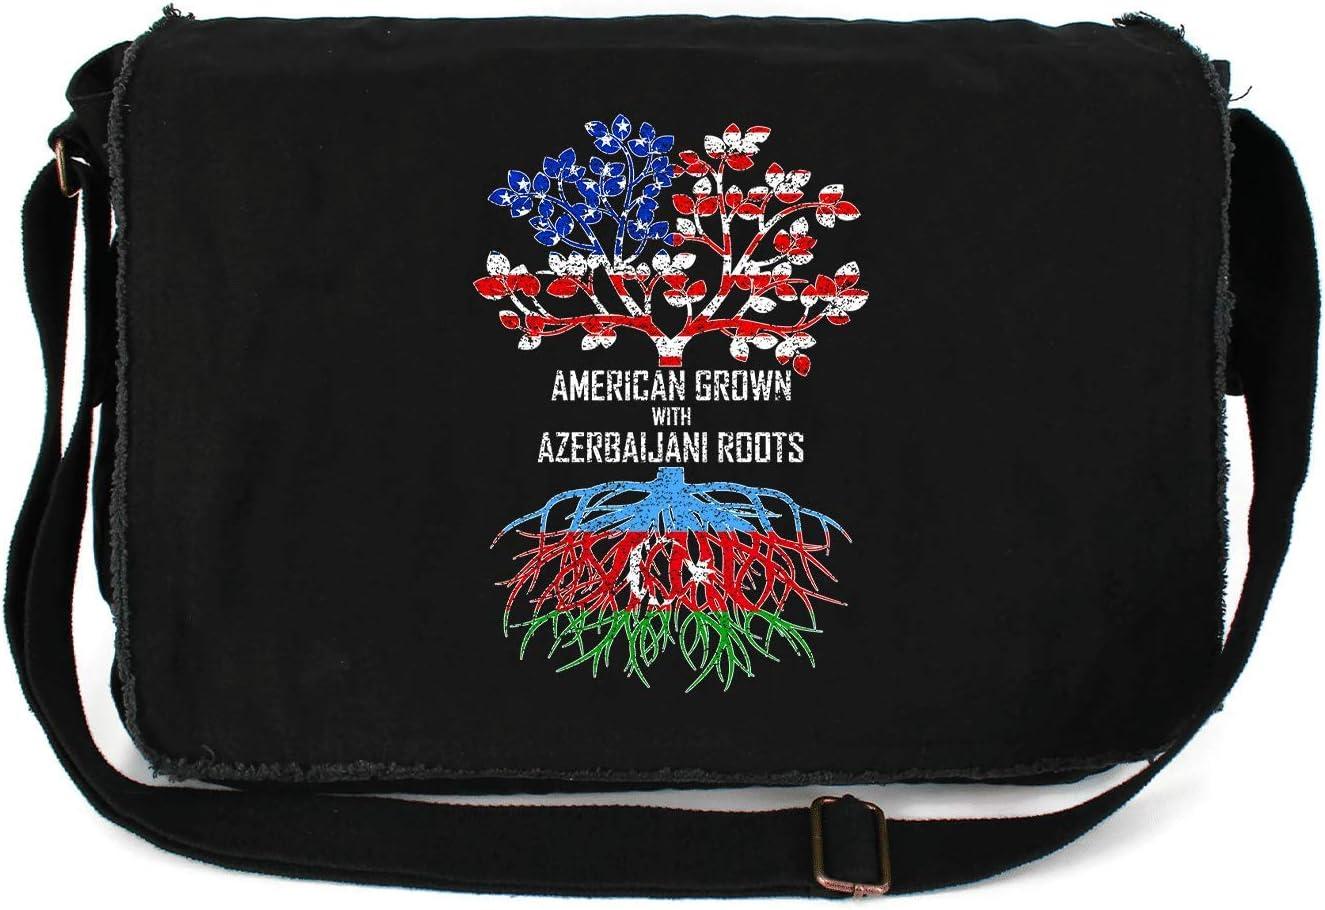 HARD EDGE DESIGN In stock American Grown Pr Roots Custom with High quality new Azerbaijani